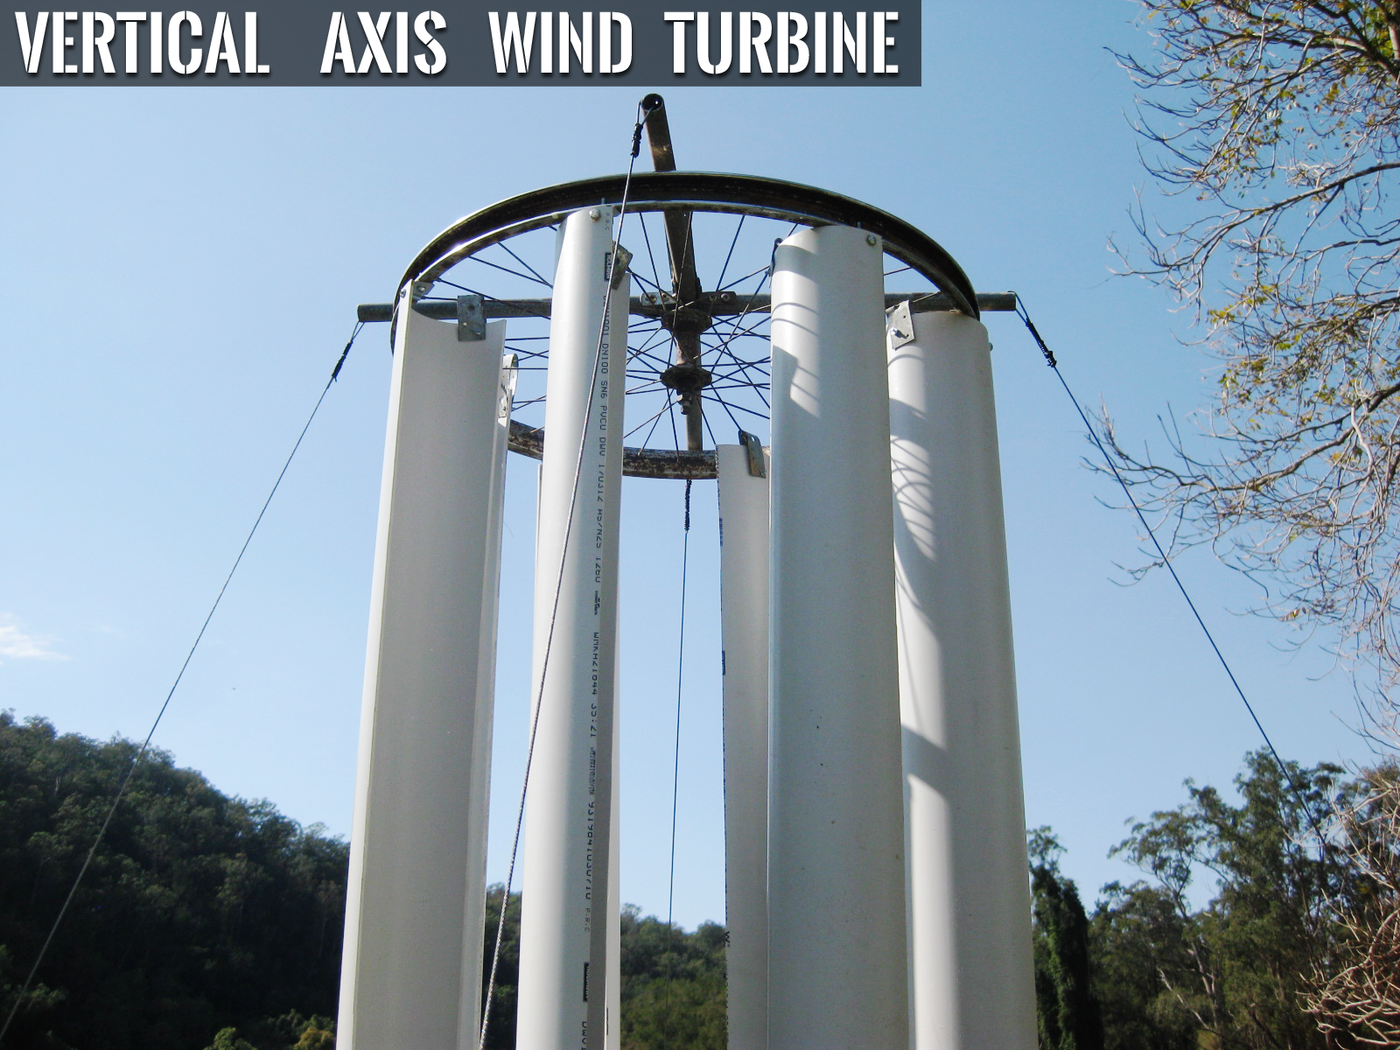 Vertical axis wind turbine by Julian G  Martin at Coroflot com